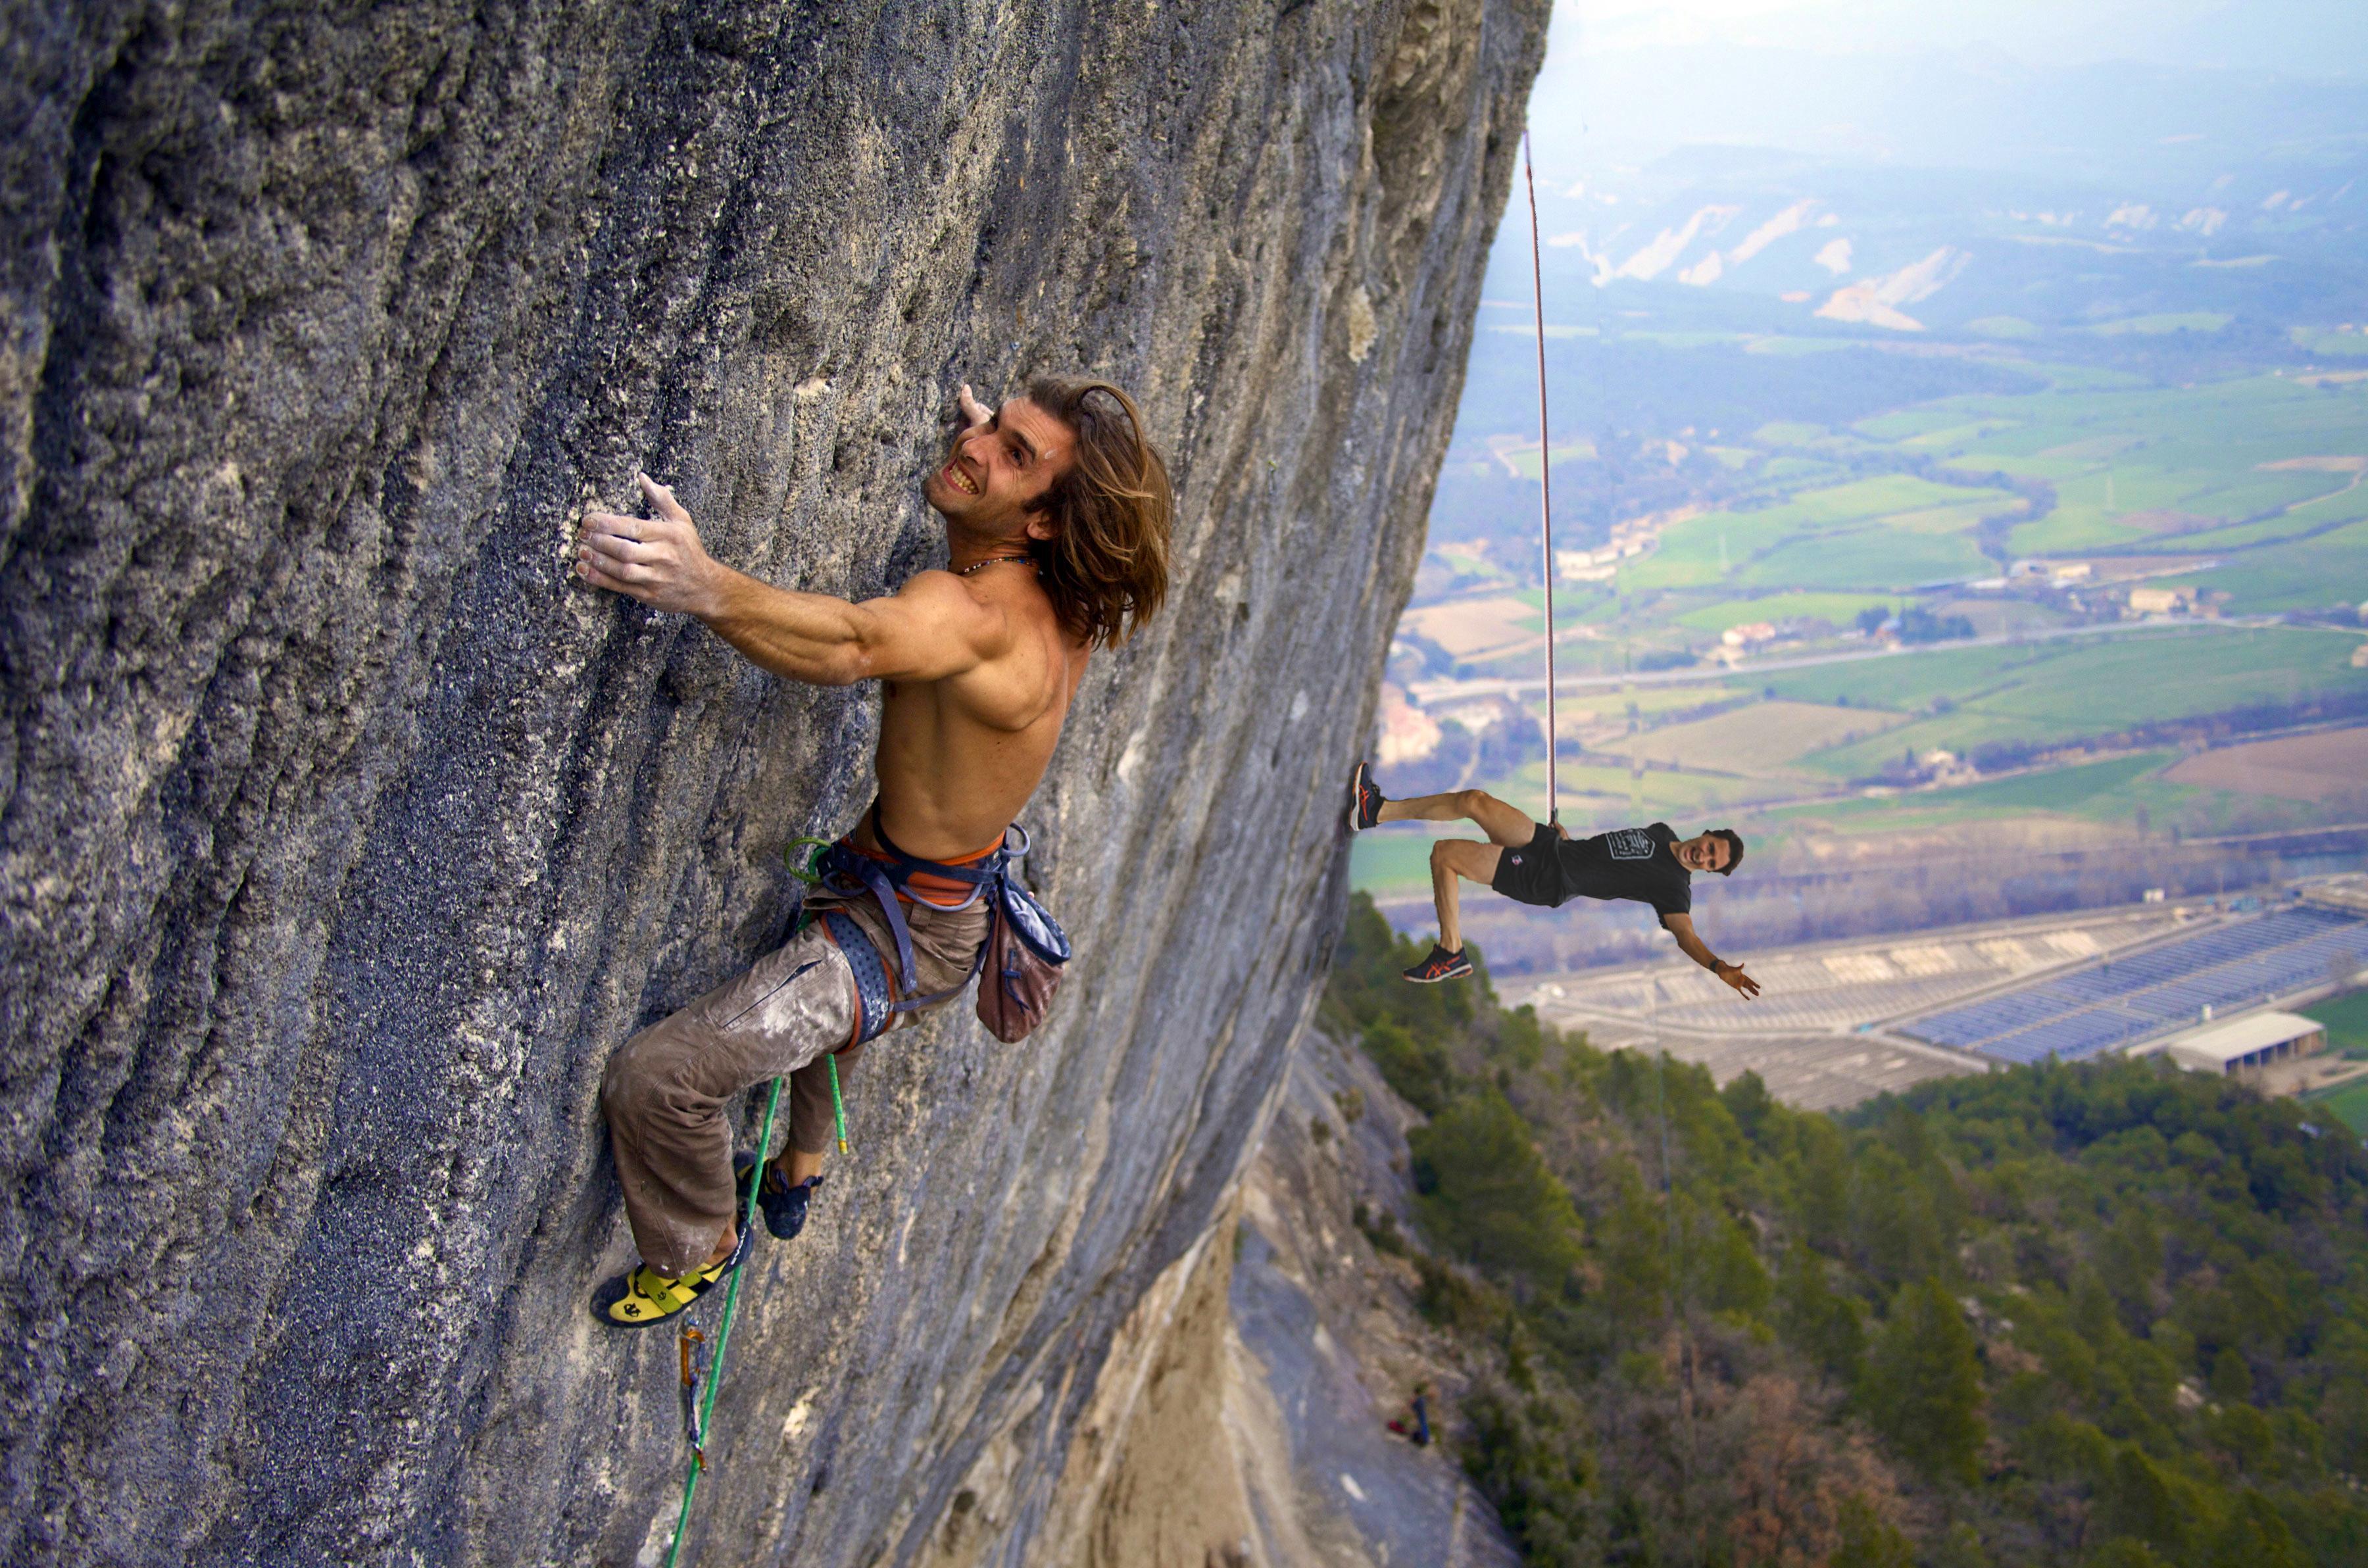 guy rock climbing naked